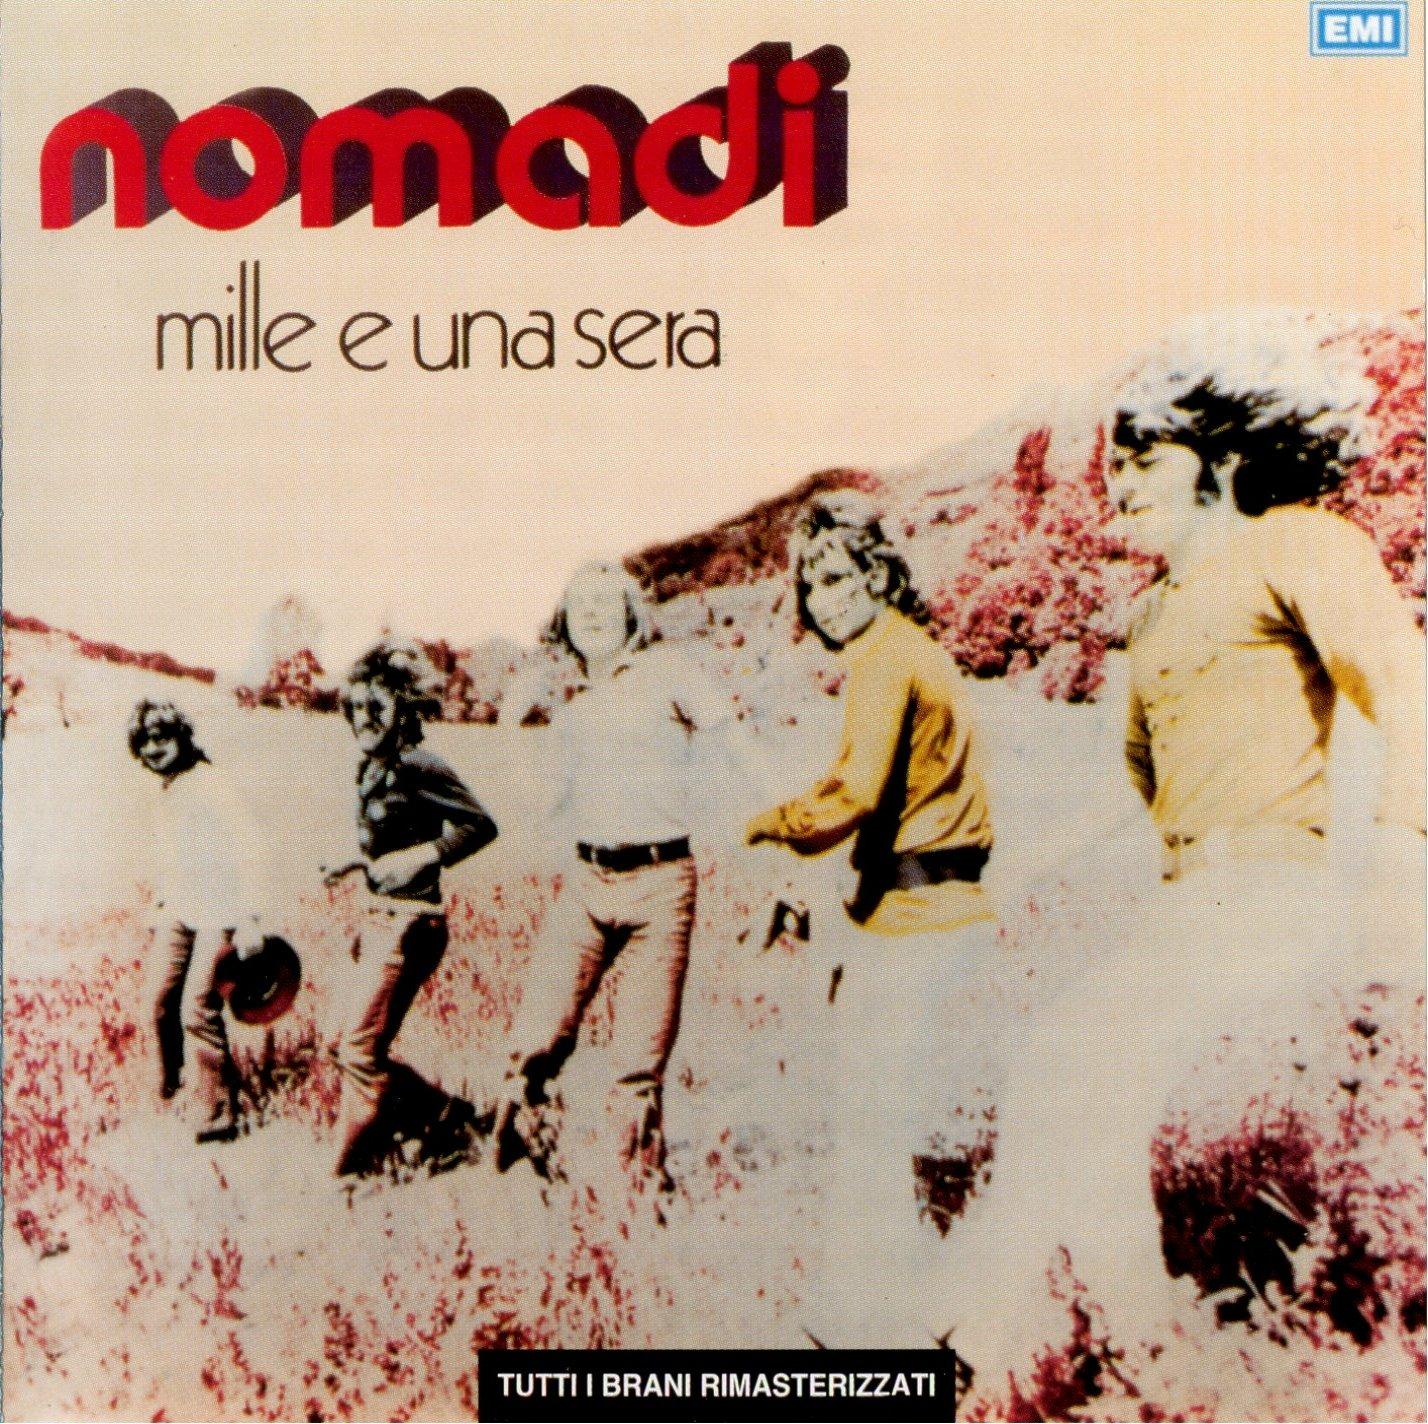 nomadi_mille_e_una_sera_front